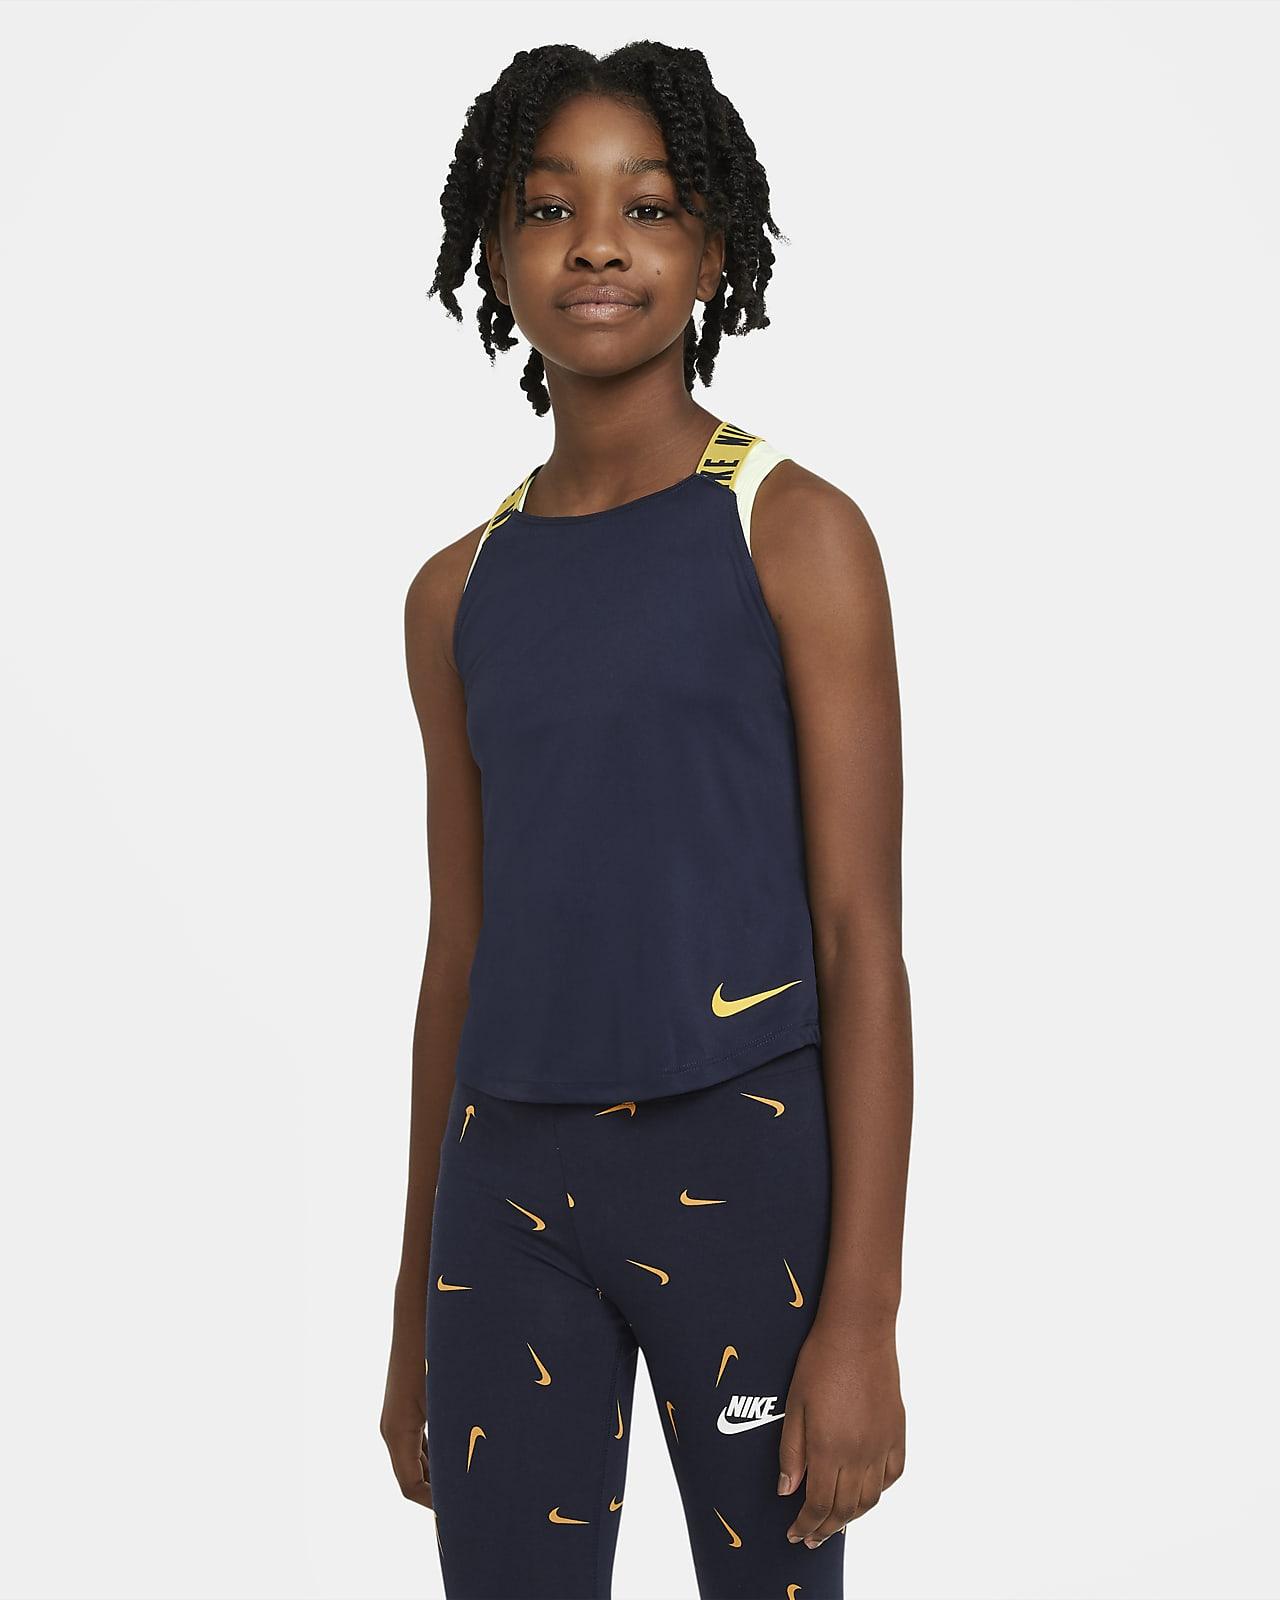 Nike Dri-FIT Trainings-Tanktop für ältere Kinder (Mädchen)